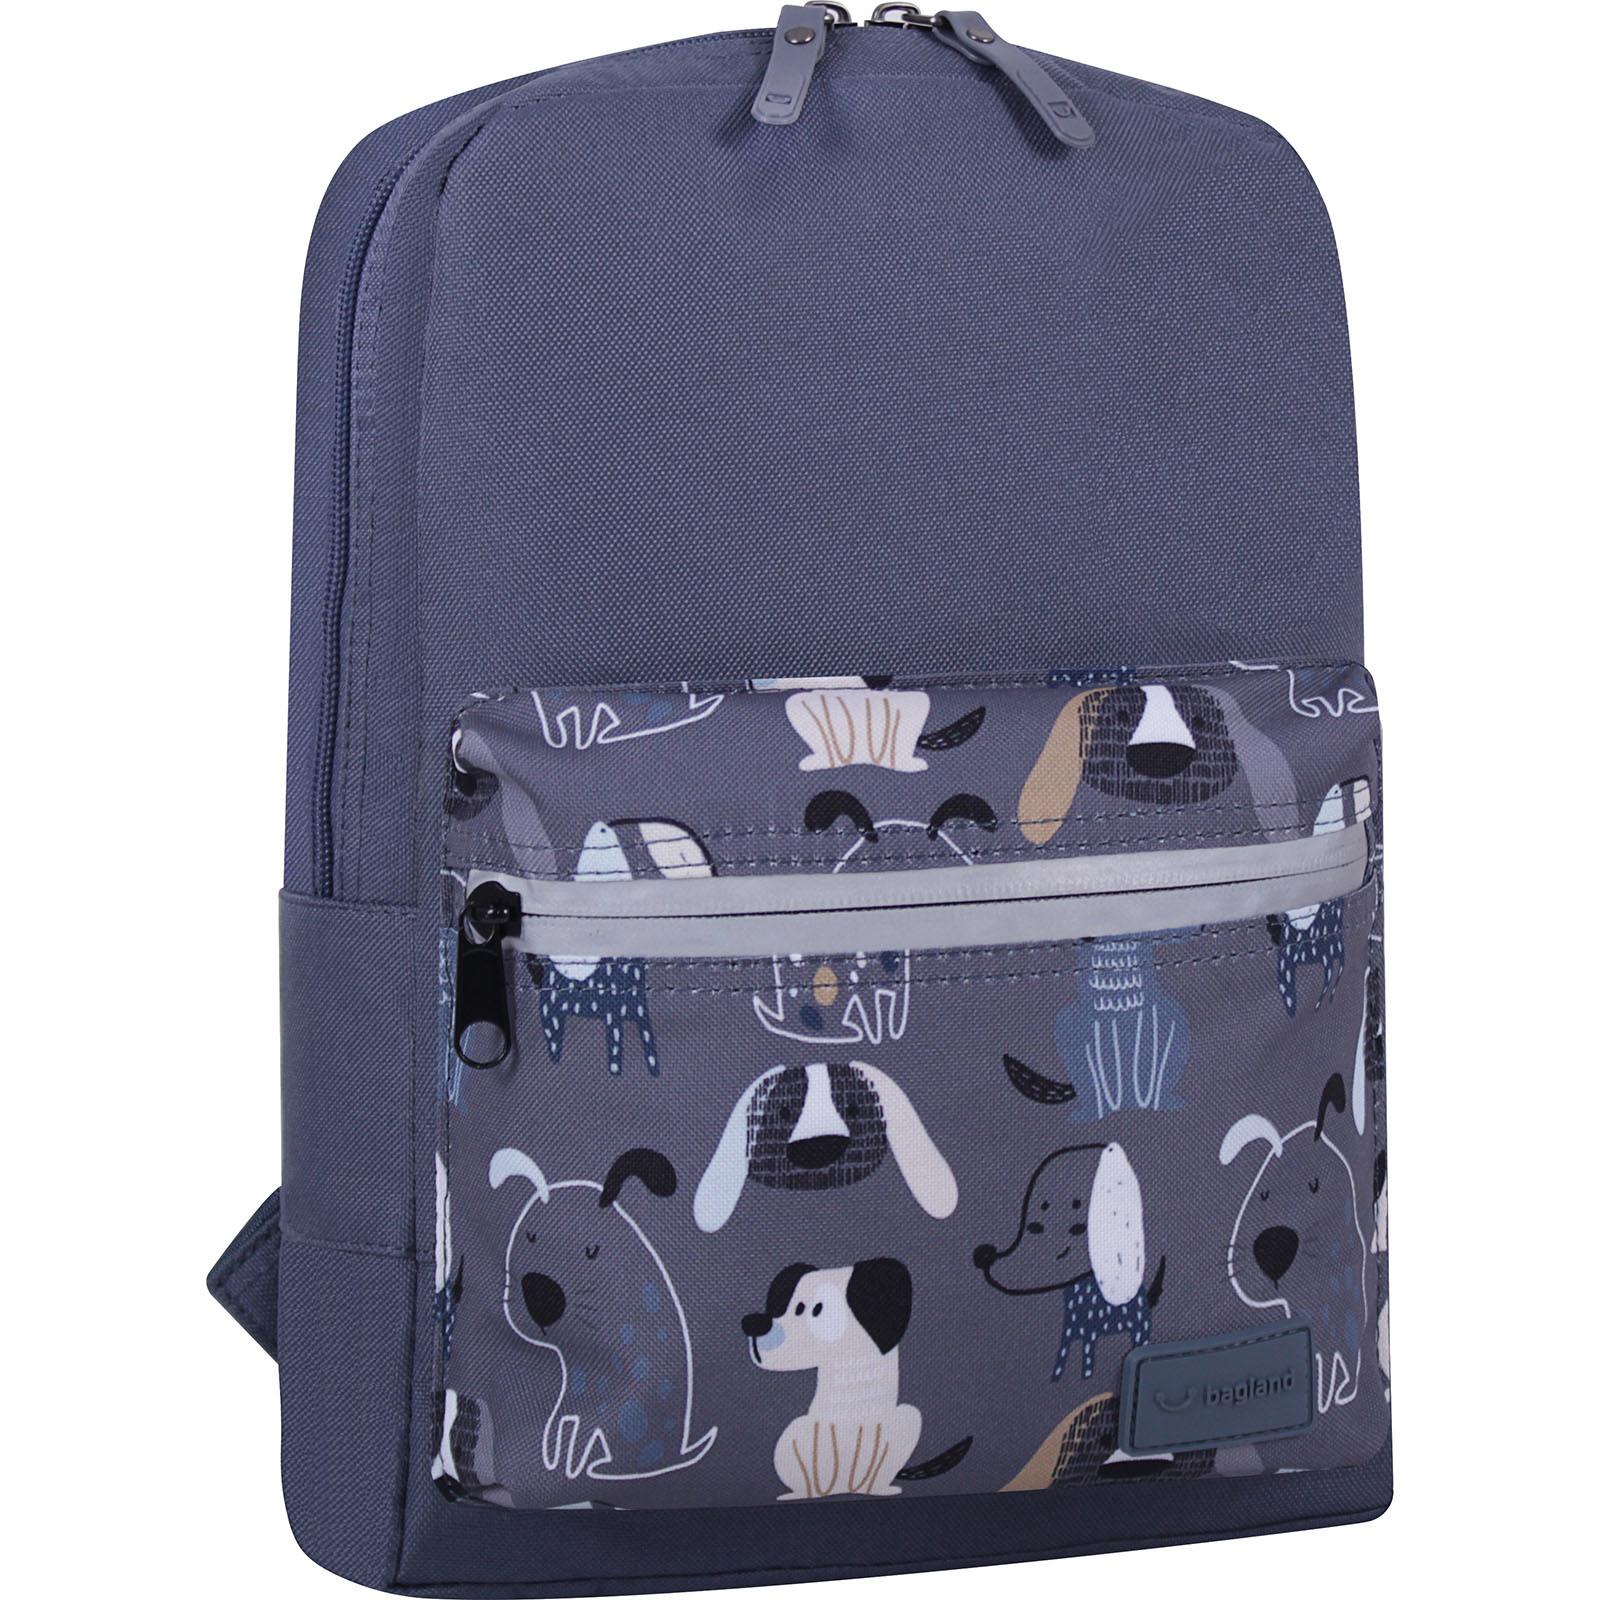 Детские рюкзаки Рюкзак Bagland Молодежный mini 8 л. серый 771 (0050866) IMG_6764_суб771_-1600.jpg